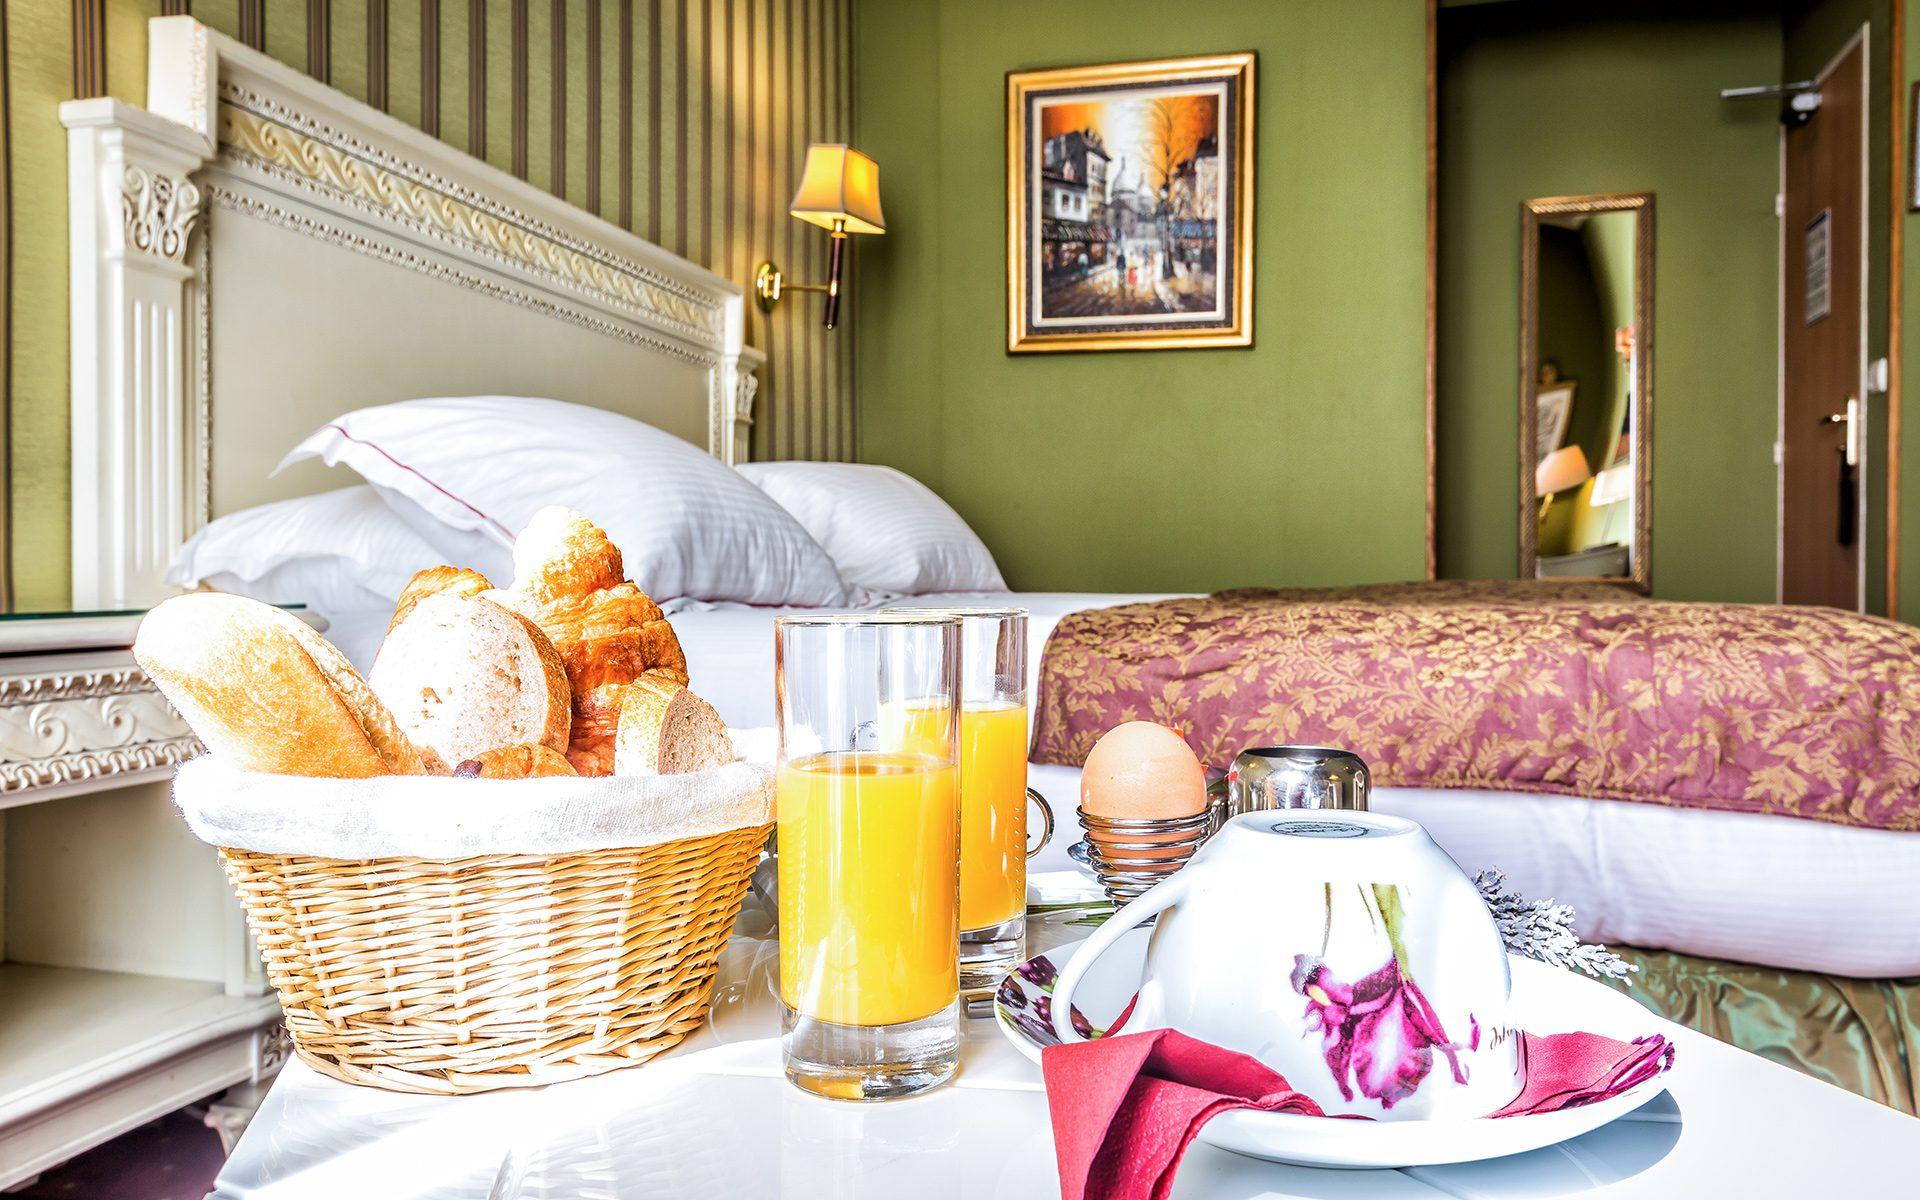 Hotel-Regence_Chambre201-Executive-5552-min